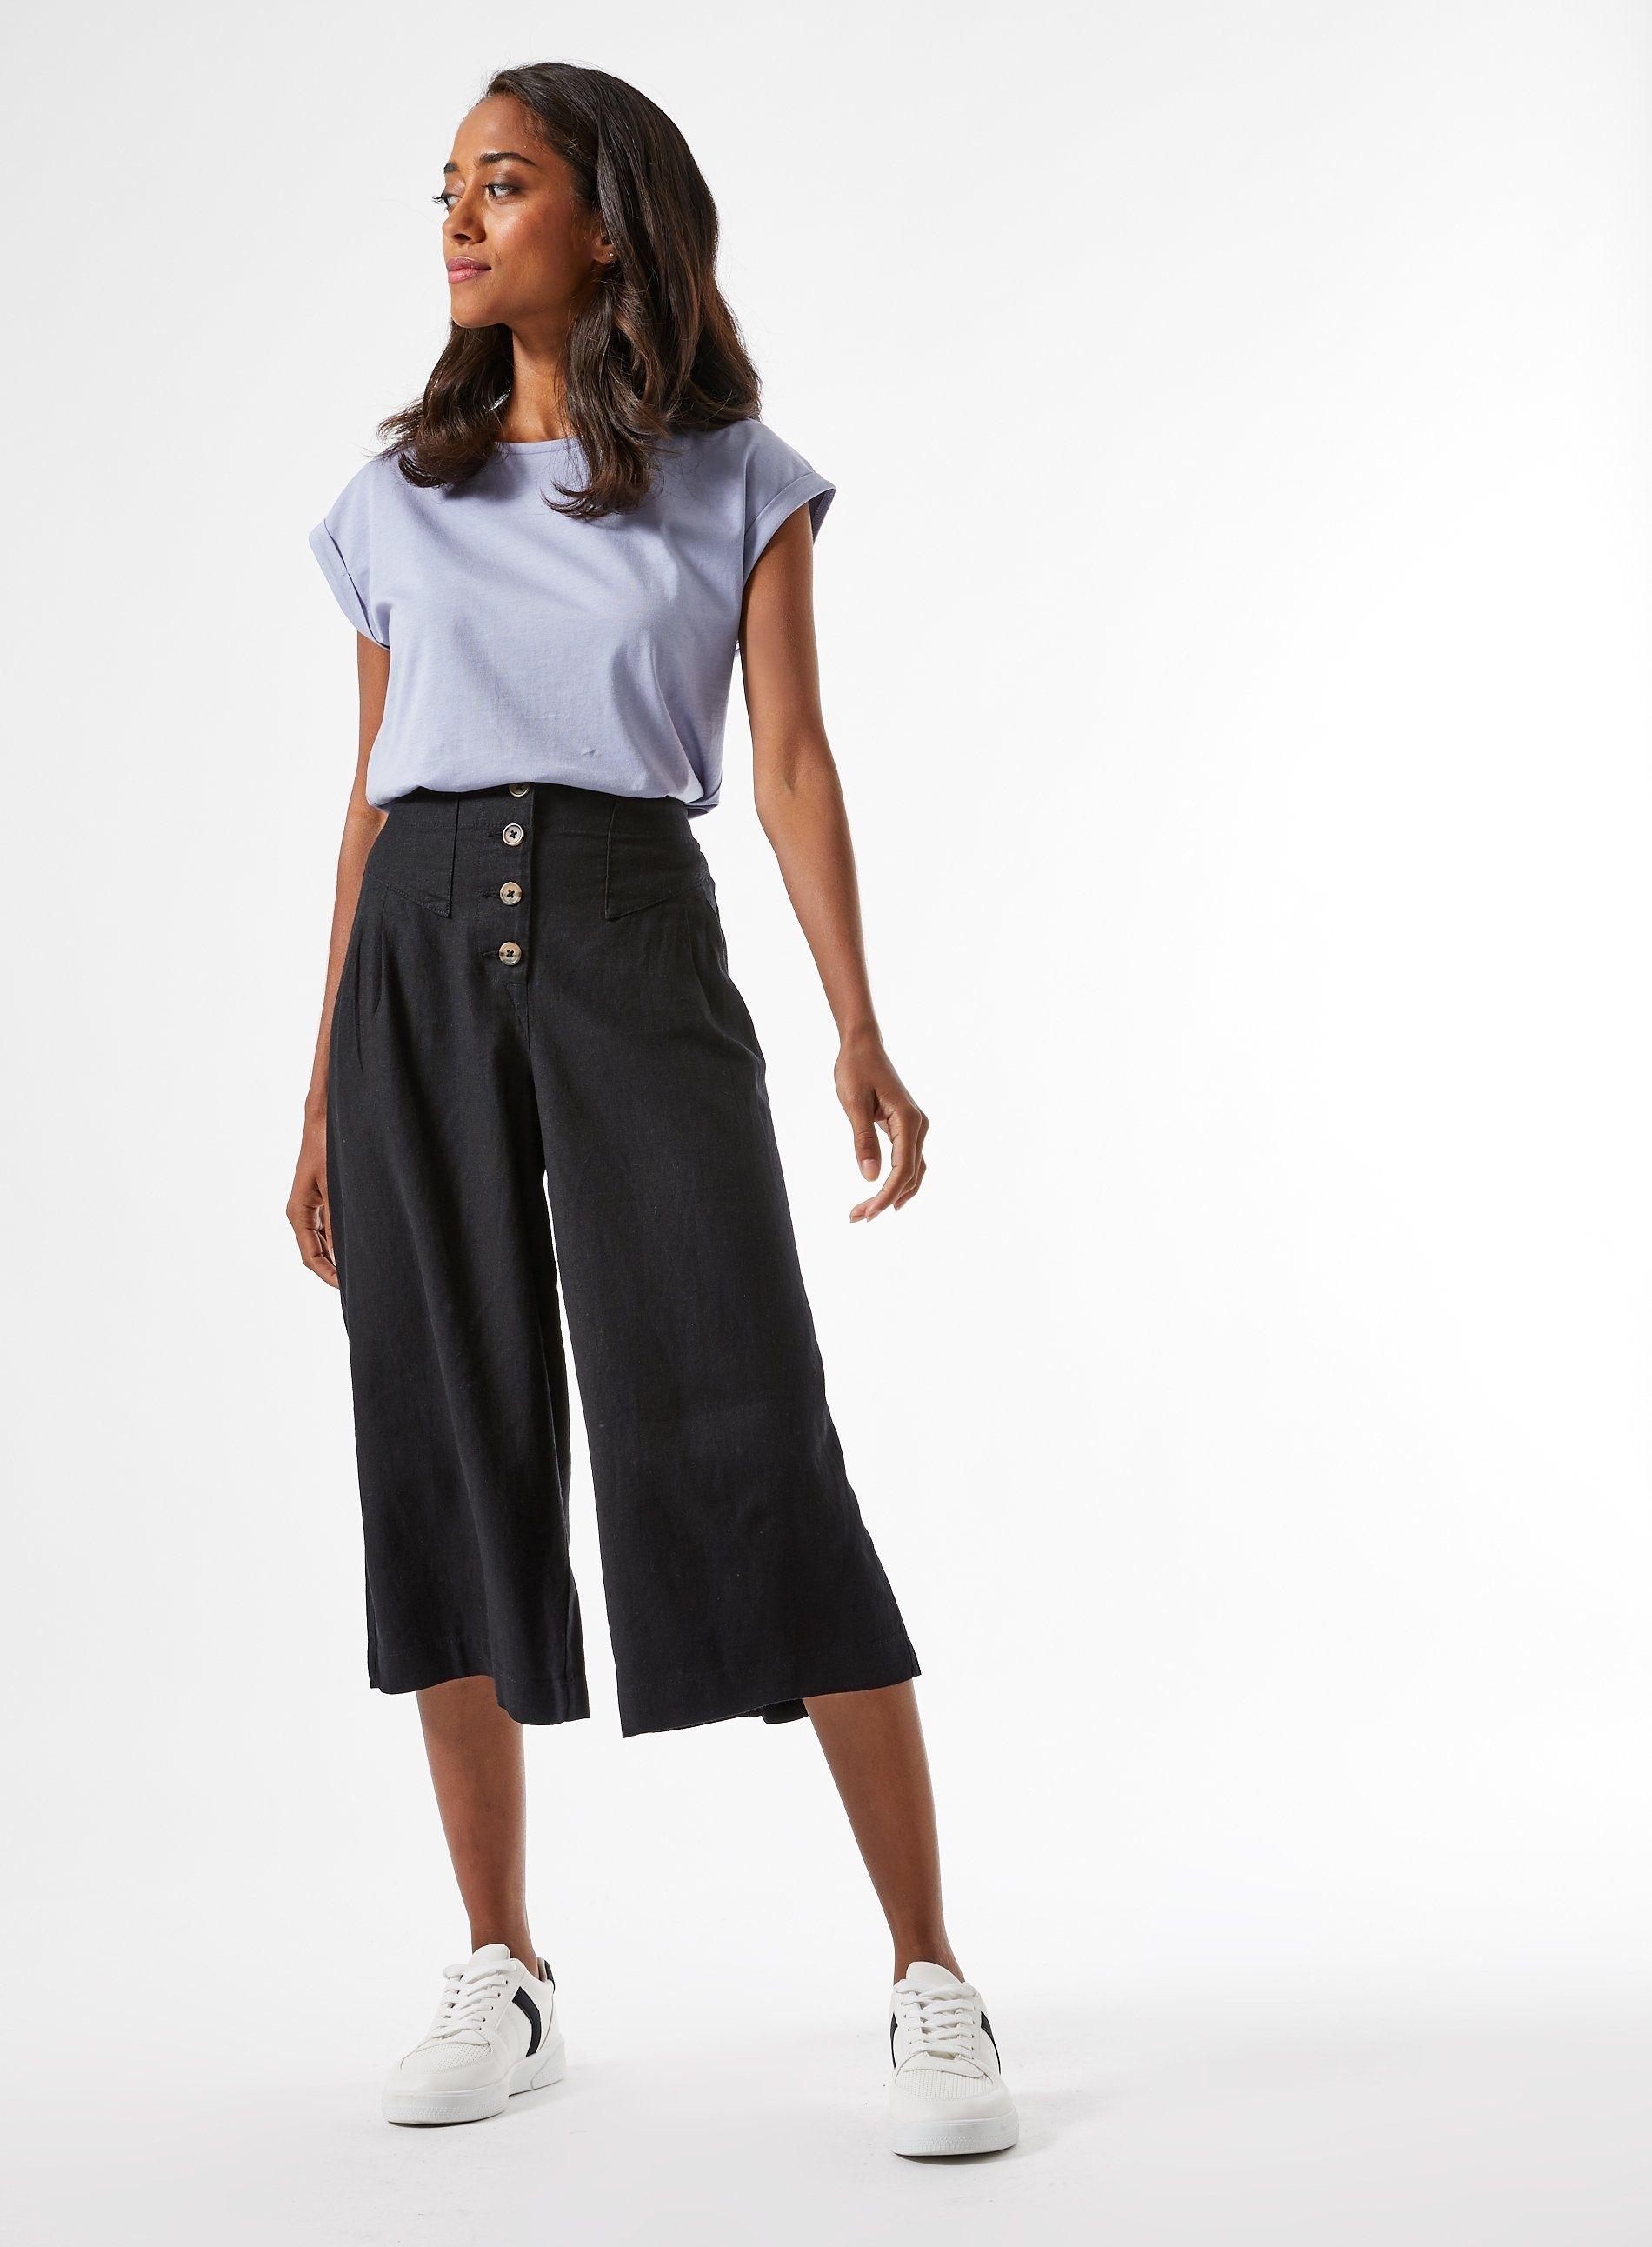 Dorothy Perkins Womens Petite Black Culottes Pockets Pants Bottoms Trousers